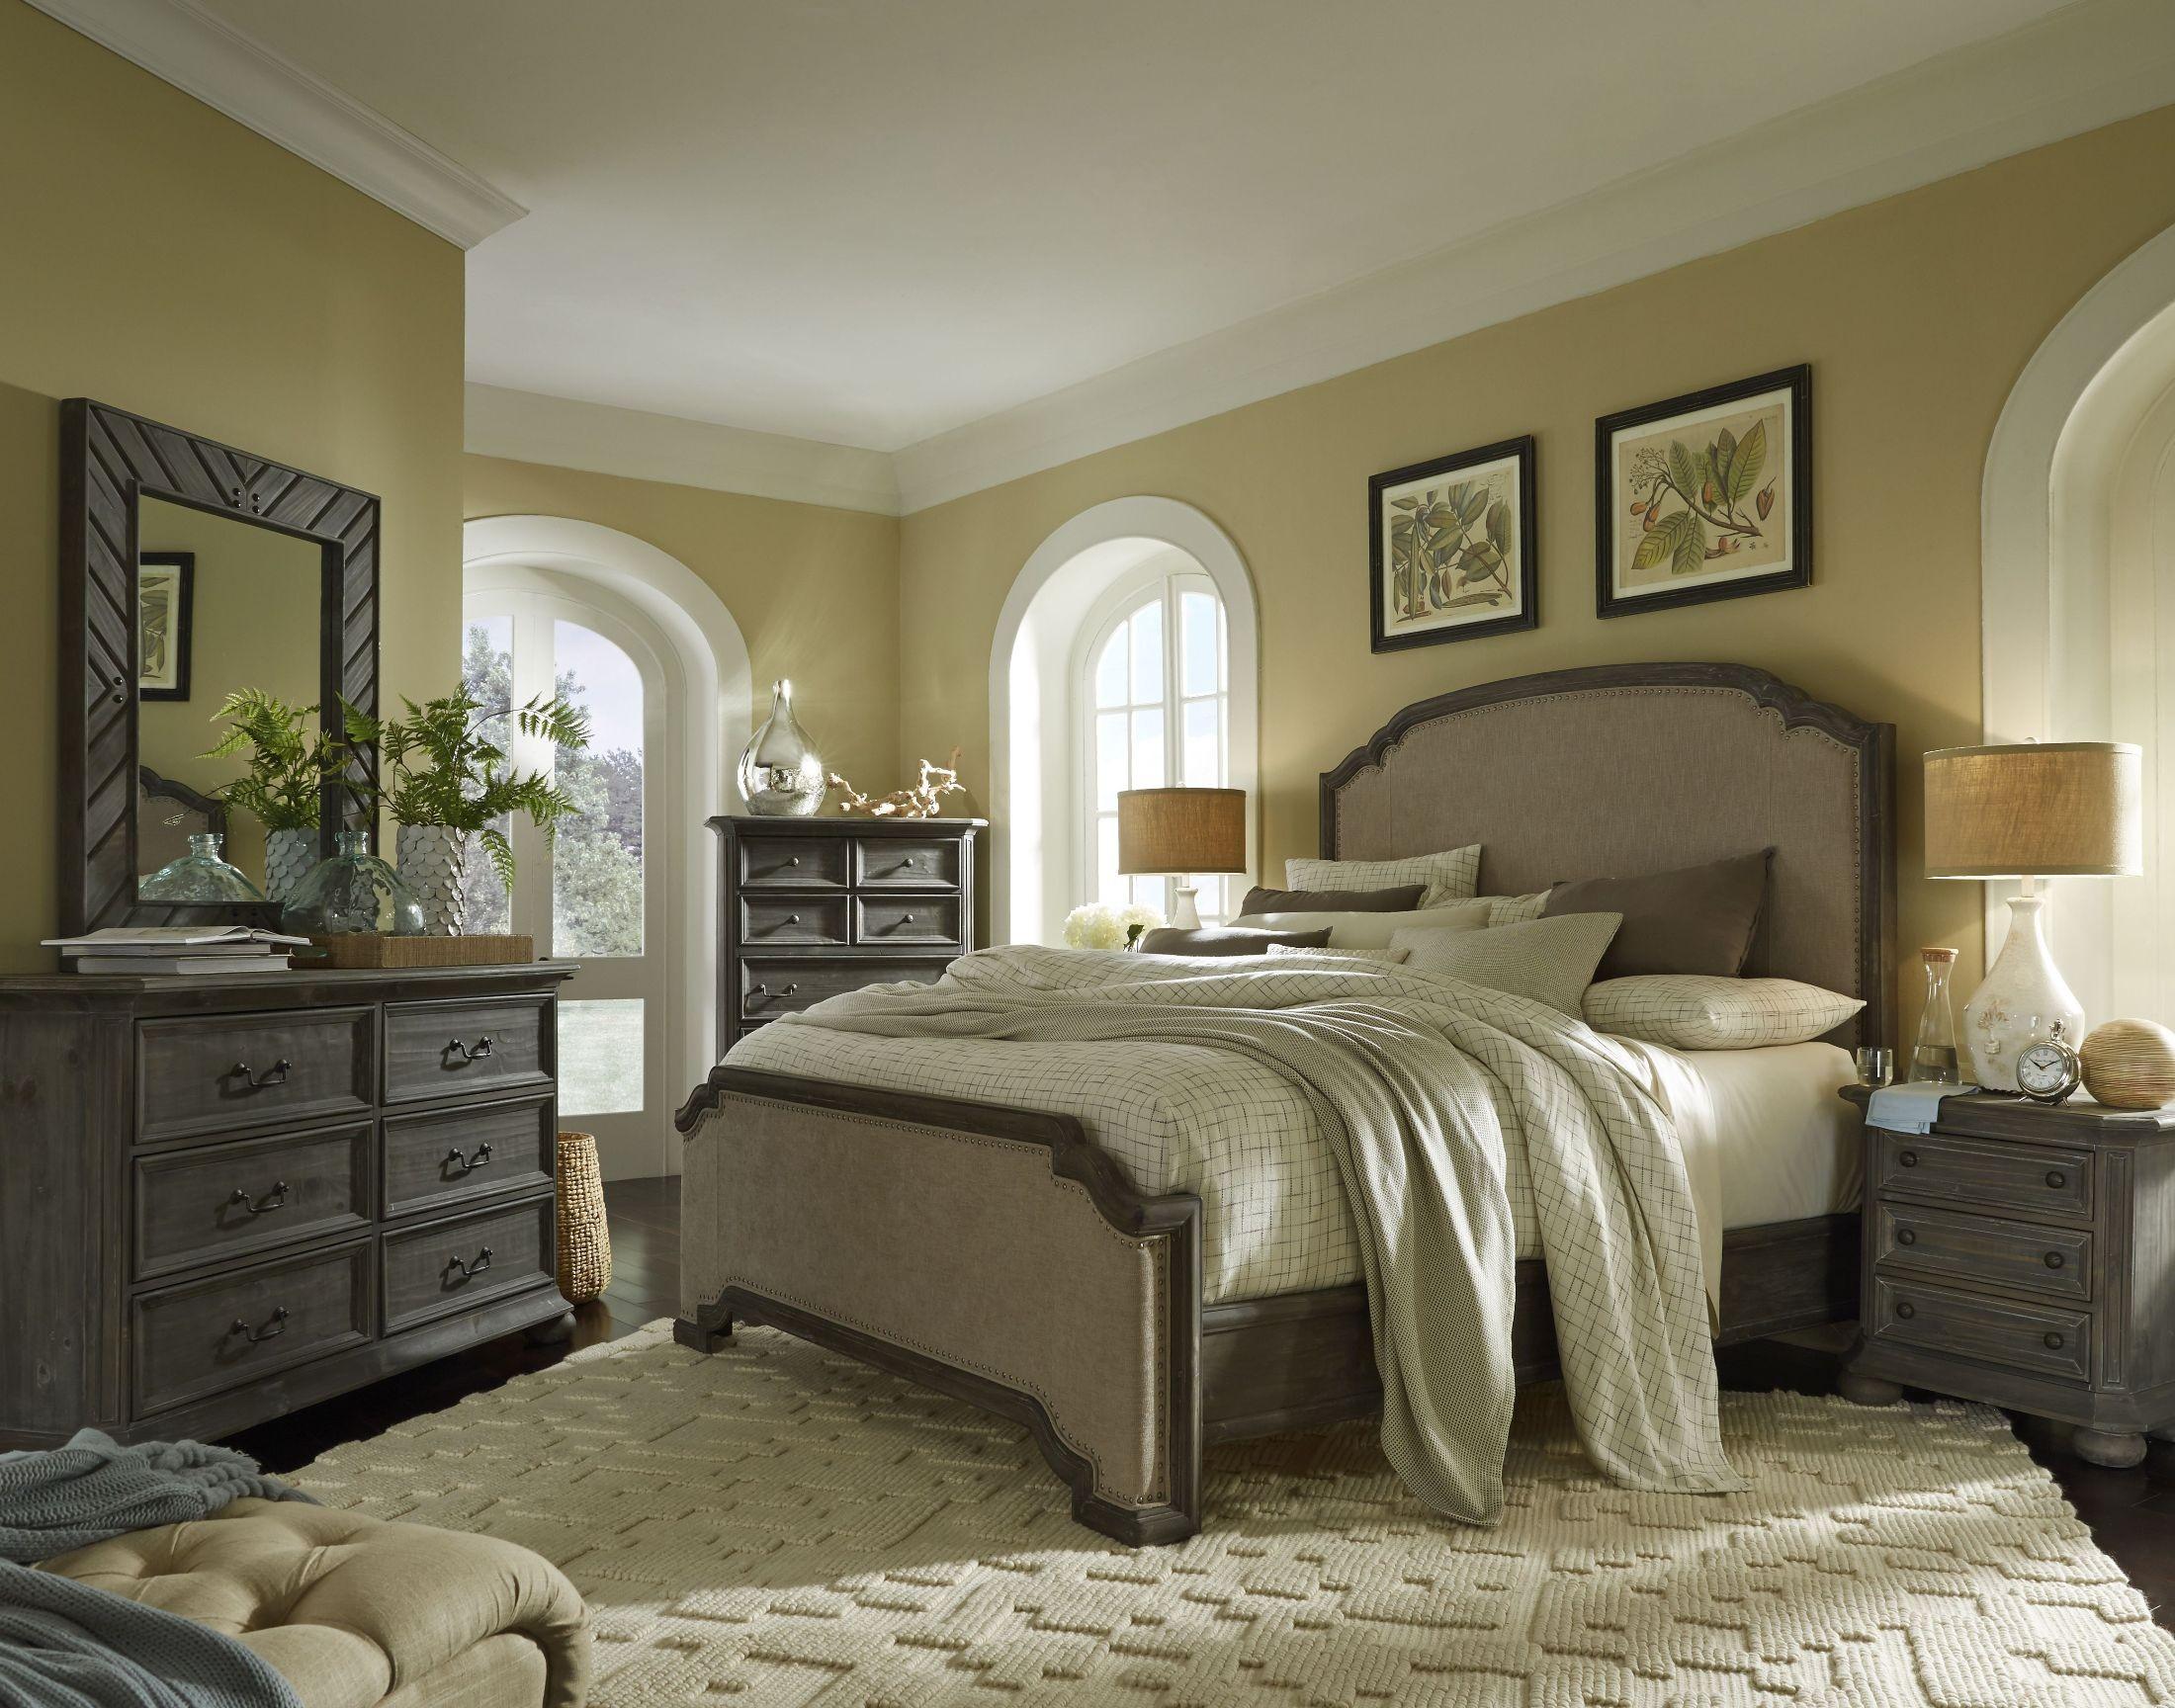 Cheswick Washed Linen Grey Upholstered Panel Bedroom Set B4095 57h 57f 57r Magnussen Home